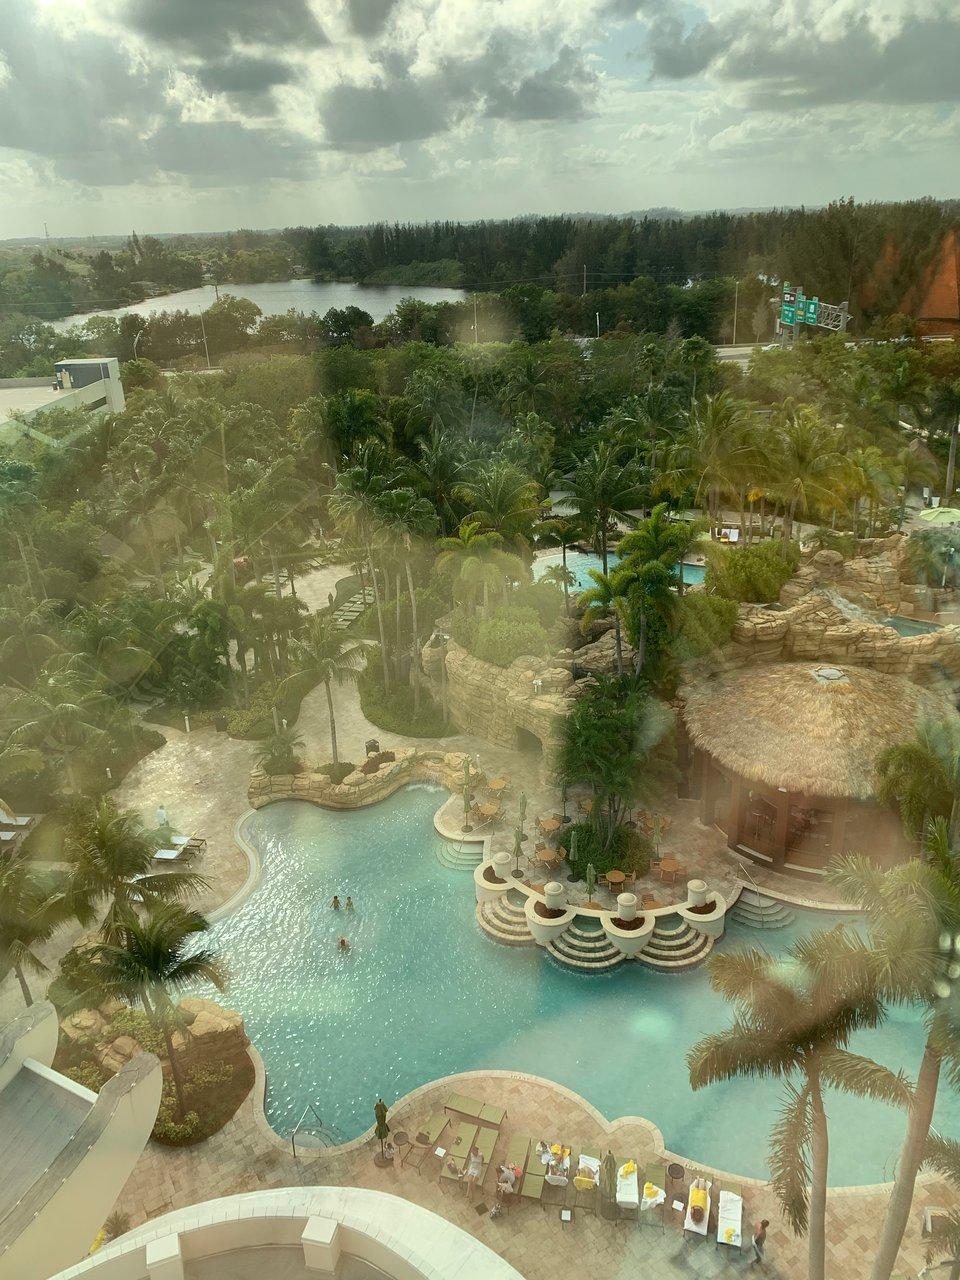 casinos in florida near fort lauderdale